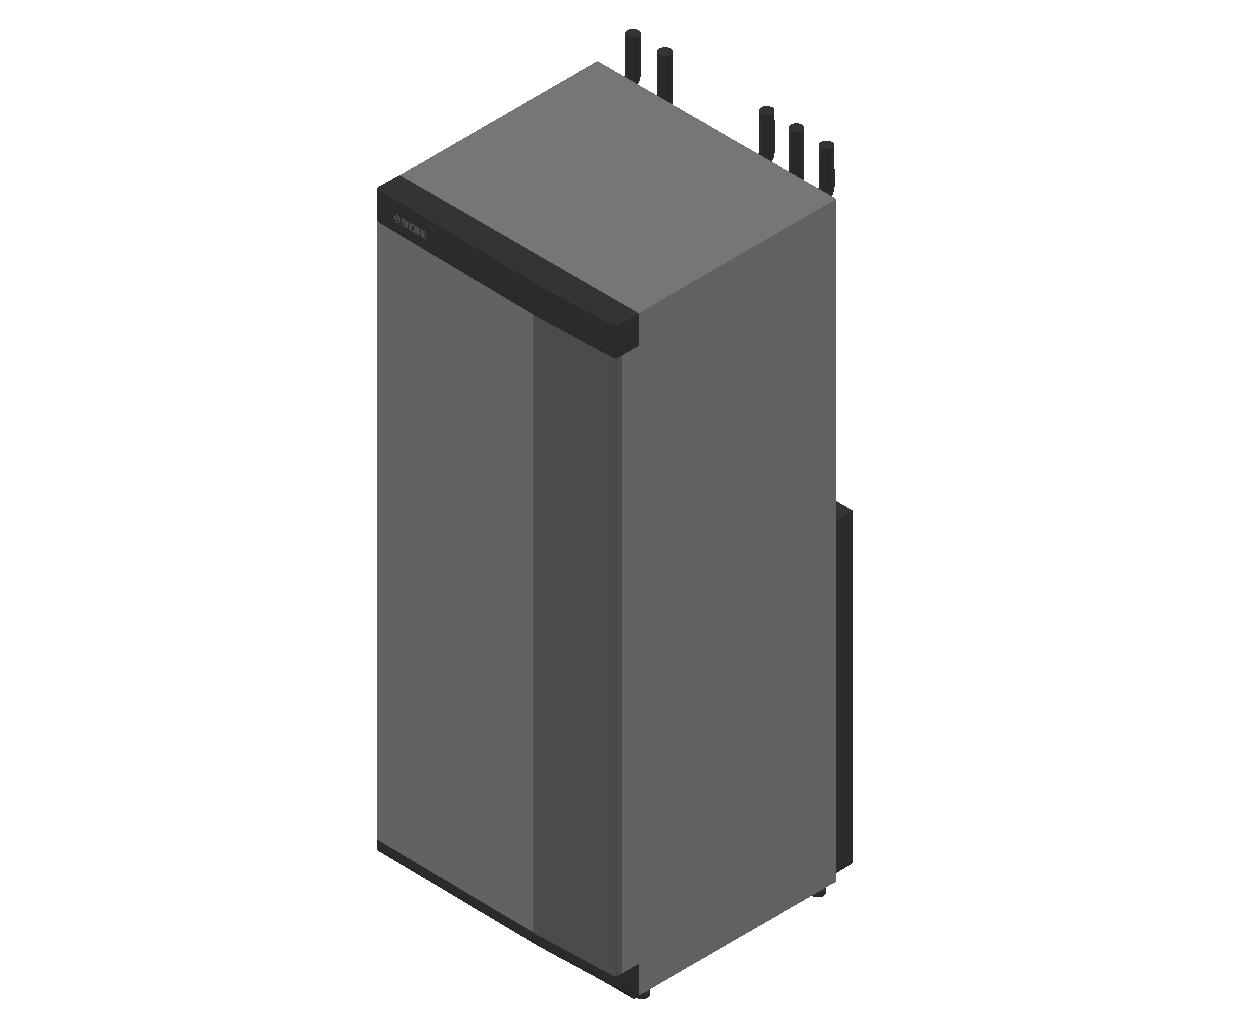 HC_Heat Pump_MEPcontent_NIBE_S1155-16 3x400V_INT-EN.dwg